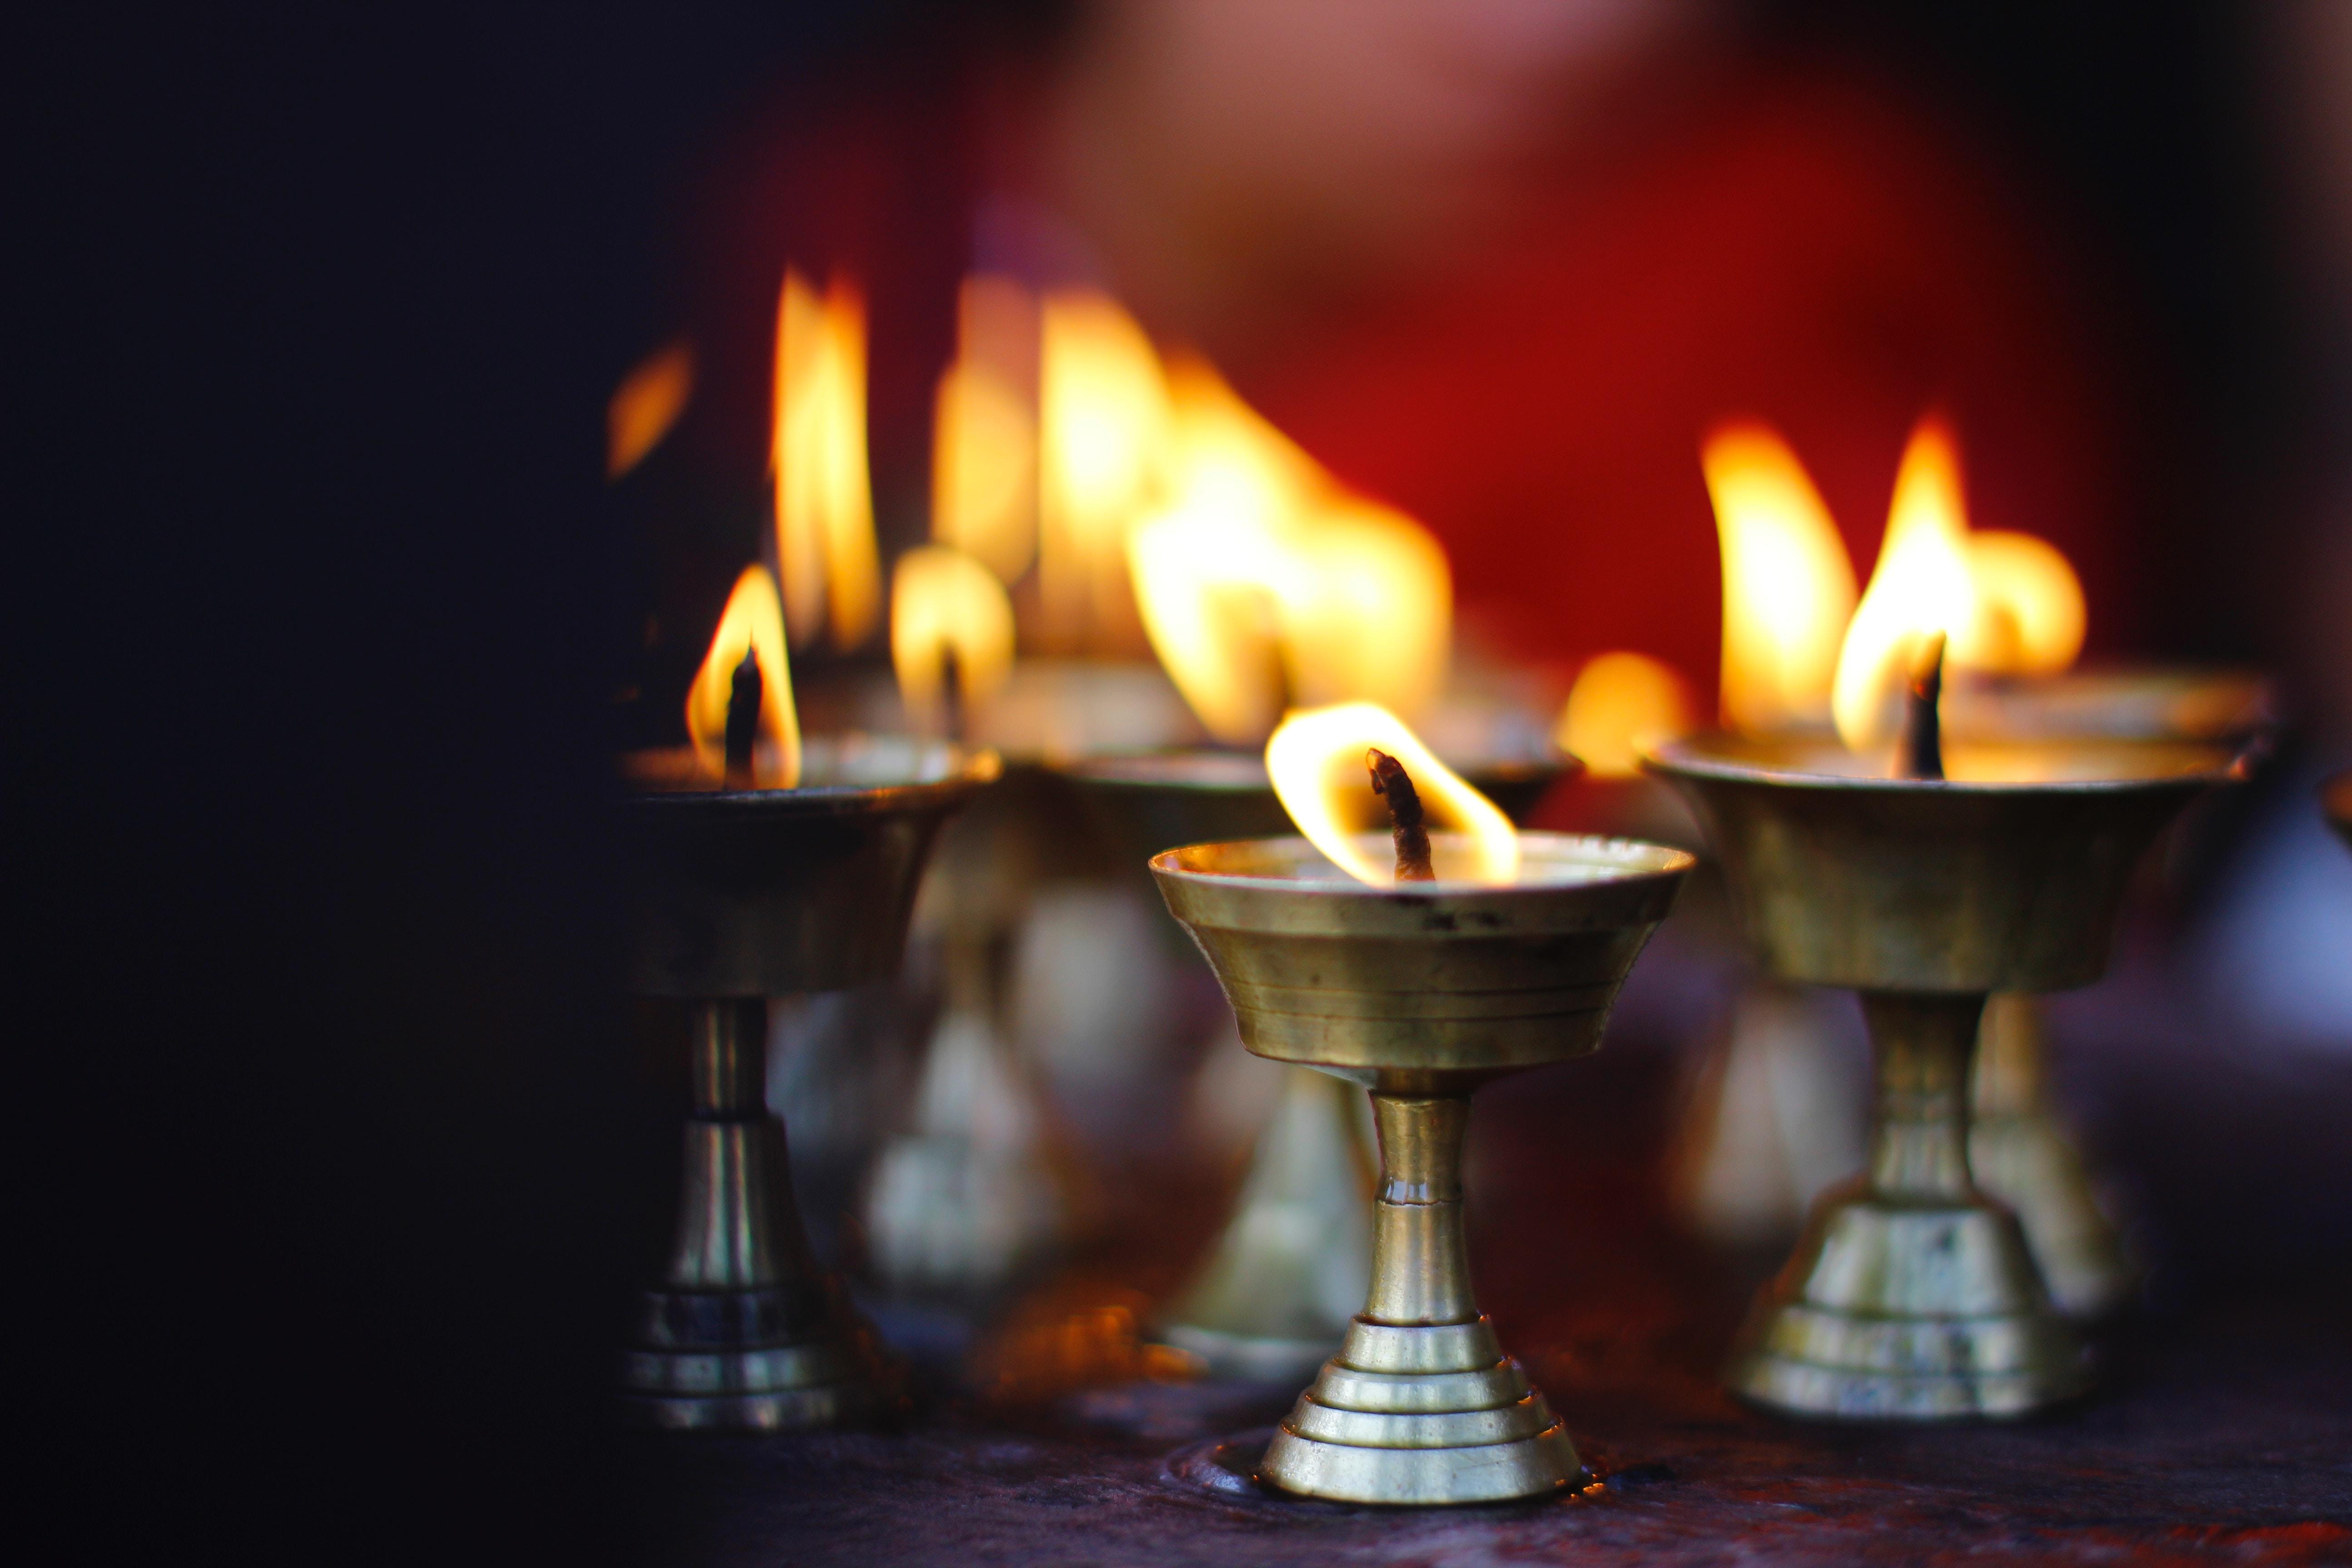 Ritual candlelight